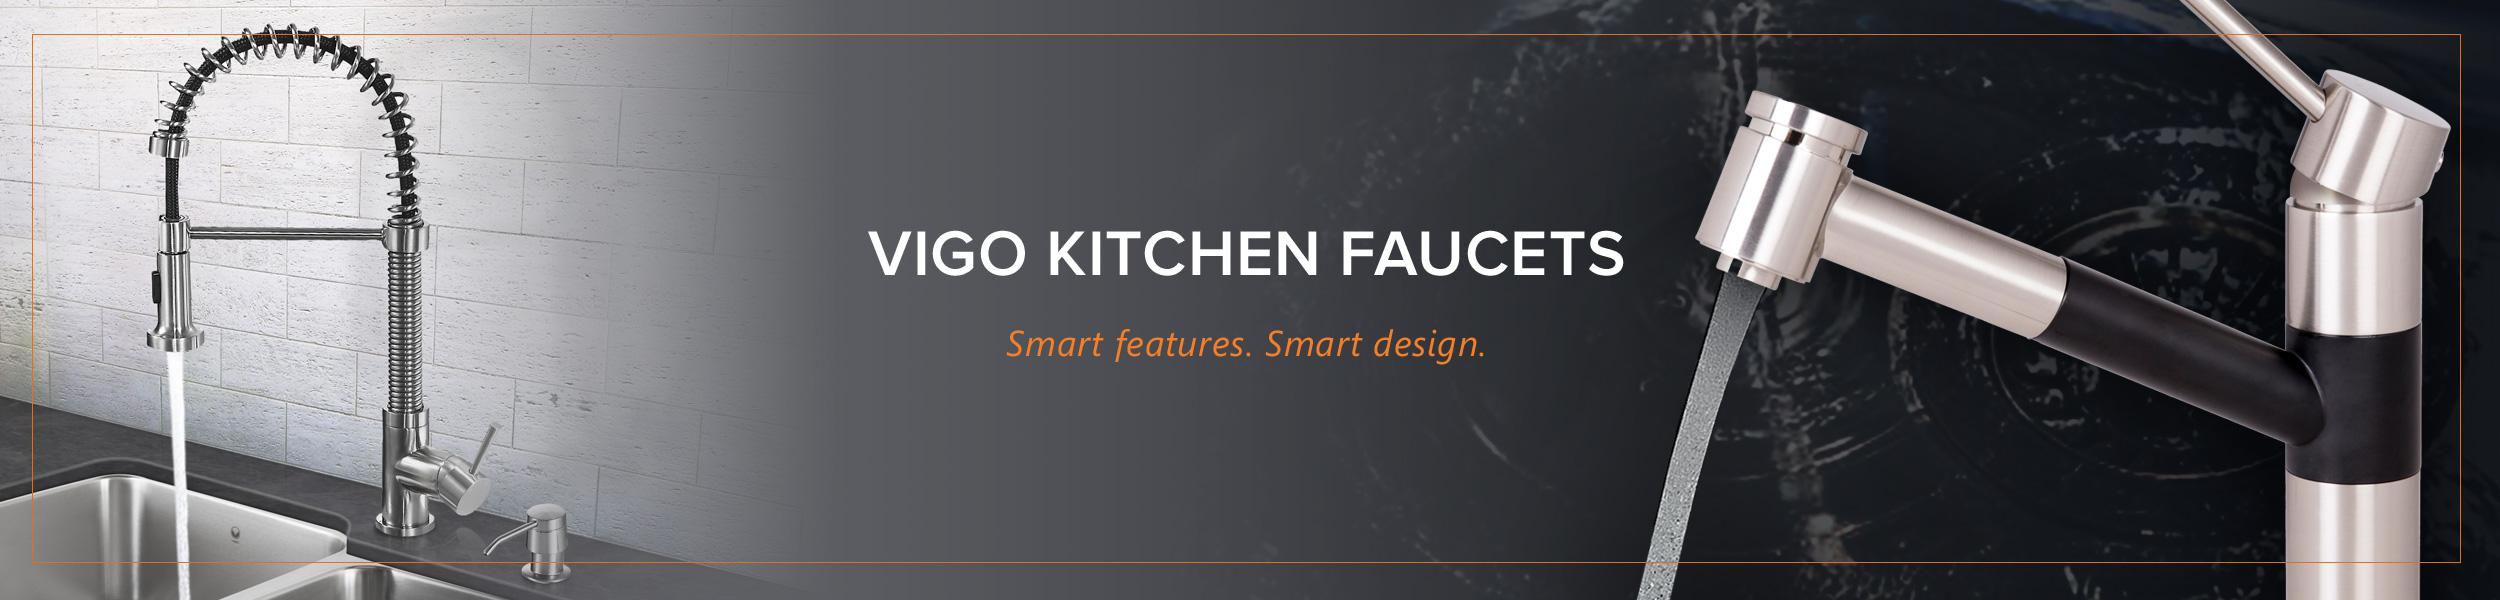 kitchen faucets discount kitchen faucets Kitchen Faucets